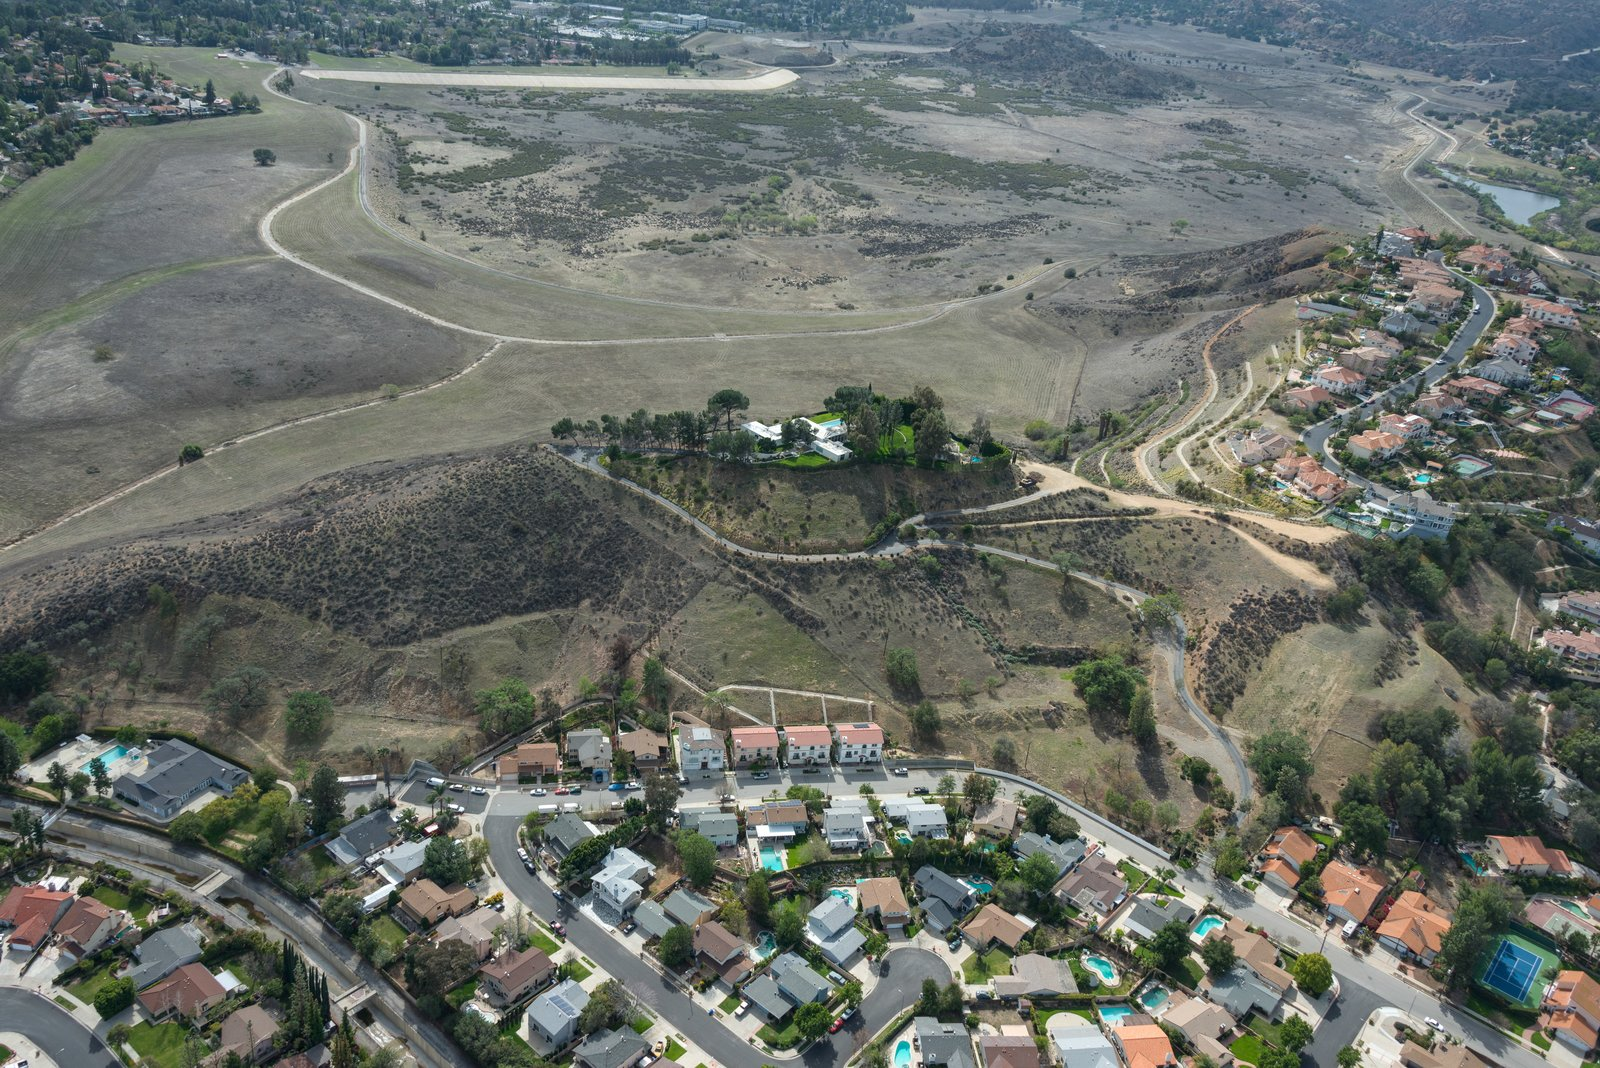 Byrdview Frank Sinatra estate aerial view